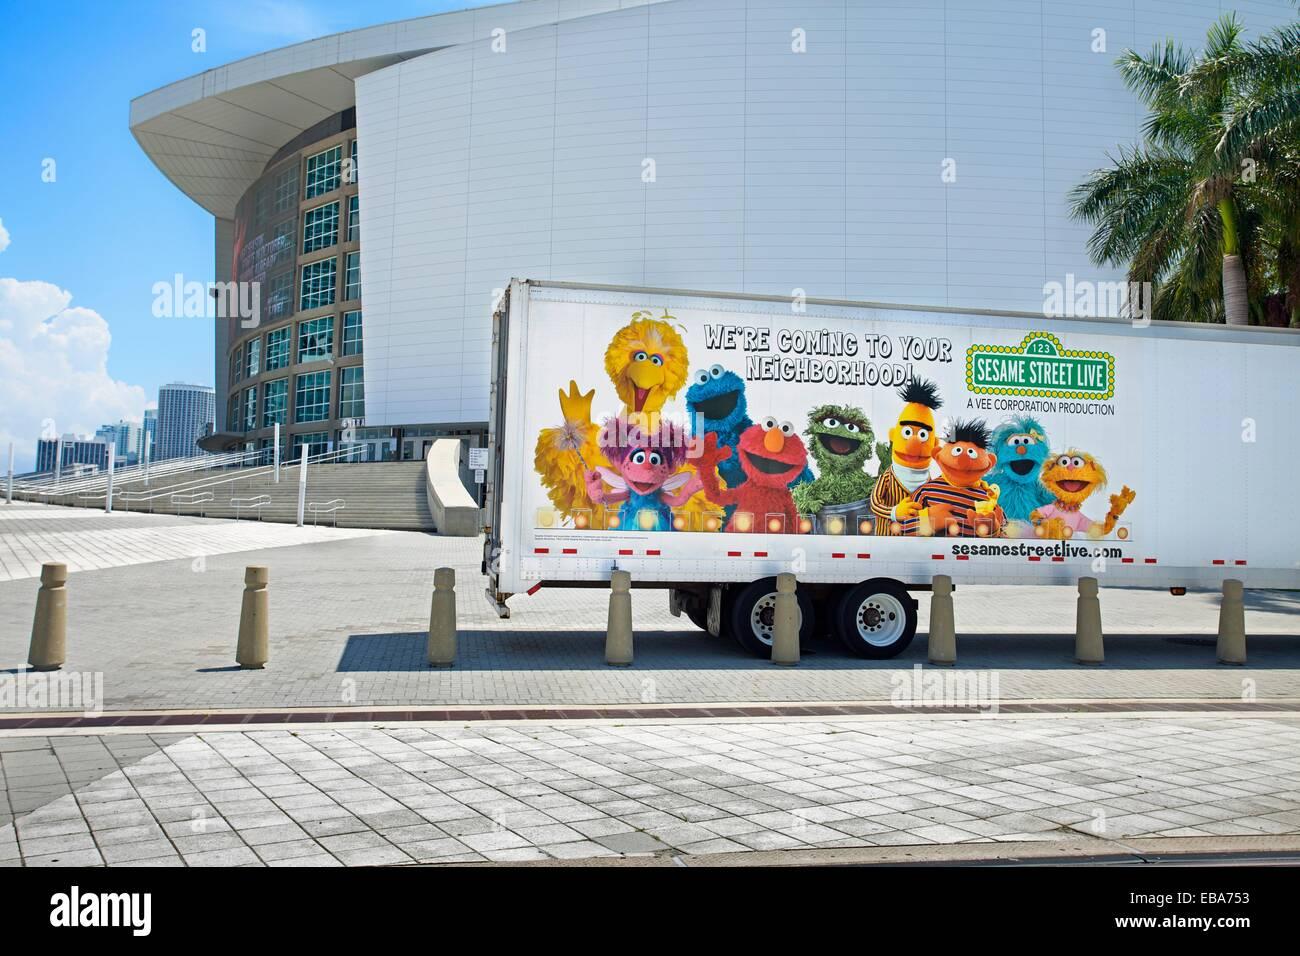 American Airline Arena  Miami  Florida  USA. - Stock Image